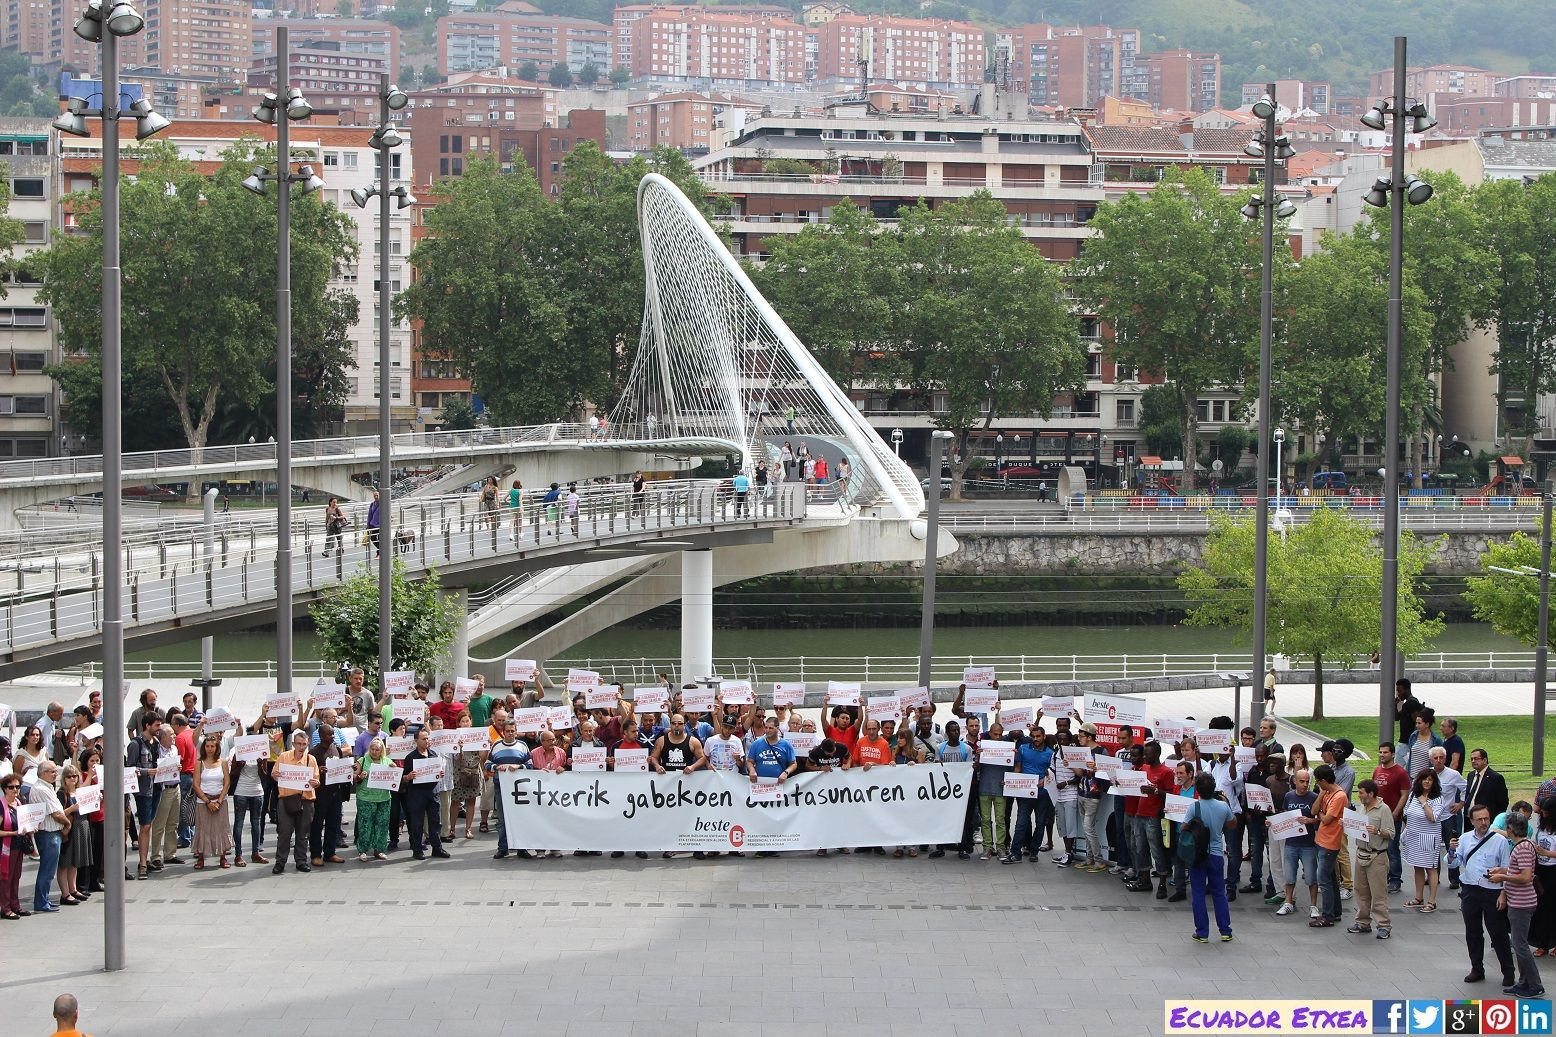 Homenaje #BesteBi a Aissa última persona fallecida sin hogar 16/07/2015 #Bilbao +fotos: http://ecuadoretxea.blogspot.com.es/2015/07/acto-de-homenaje-una-nueva-persona-sin.html